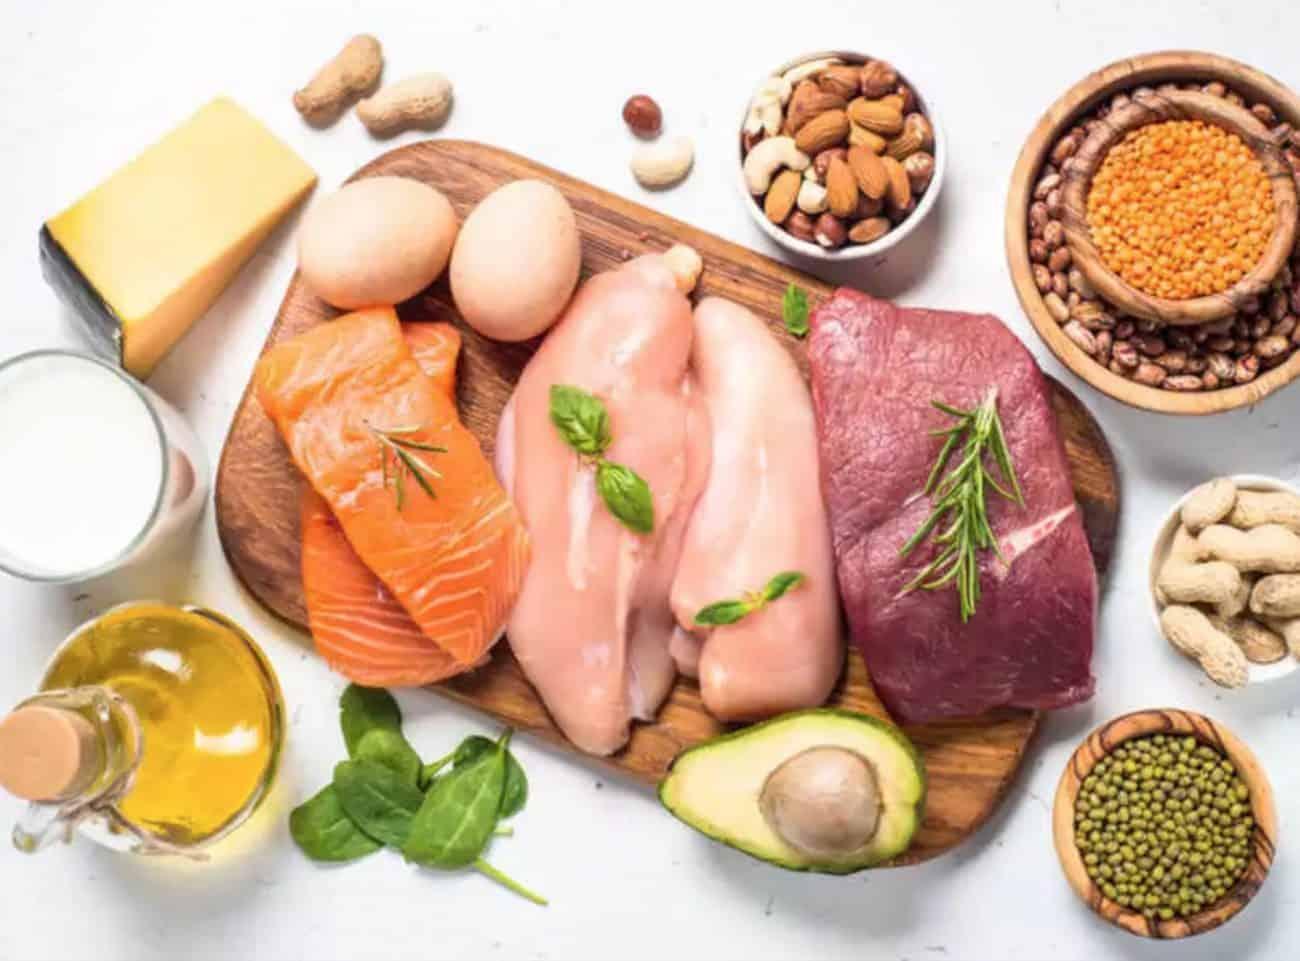 Top 8 Best High Protein Diet Cookbooks Reviews